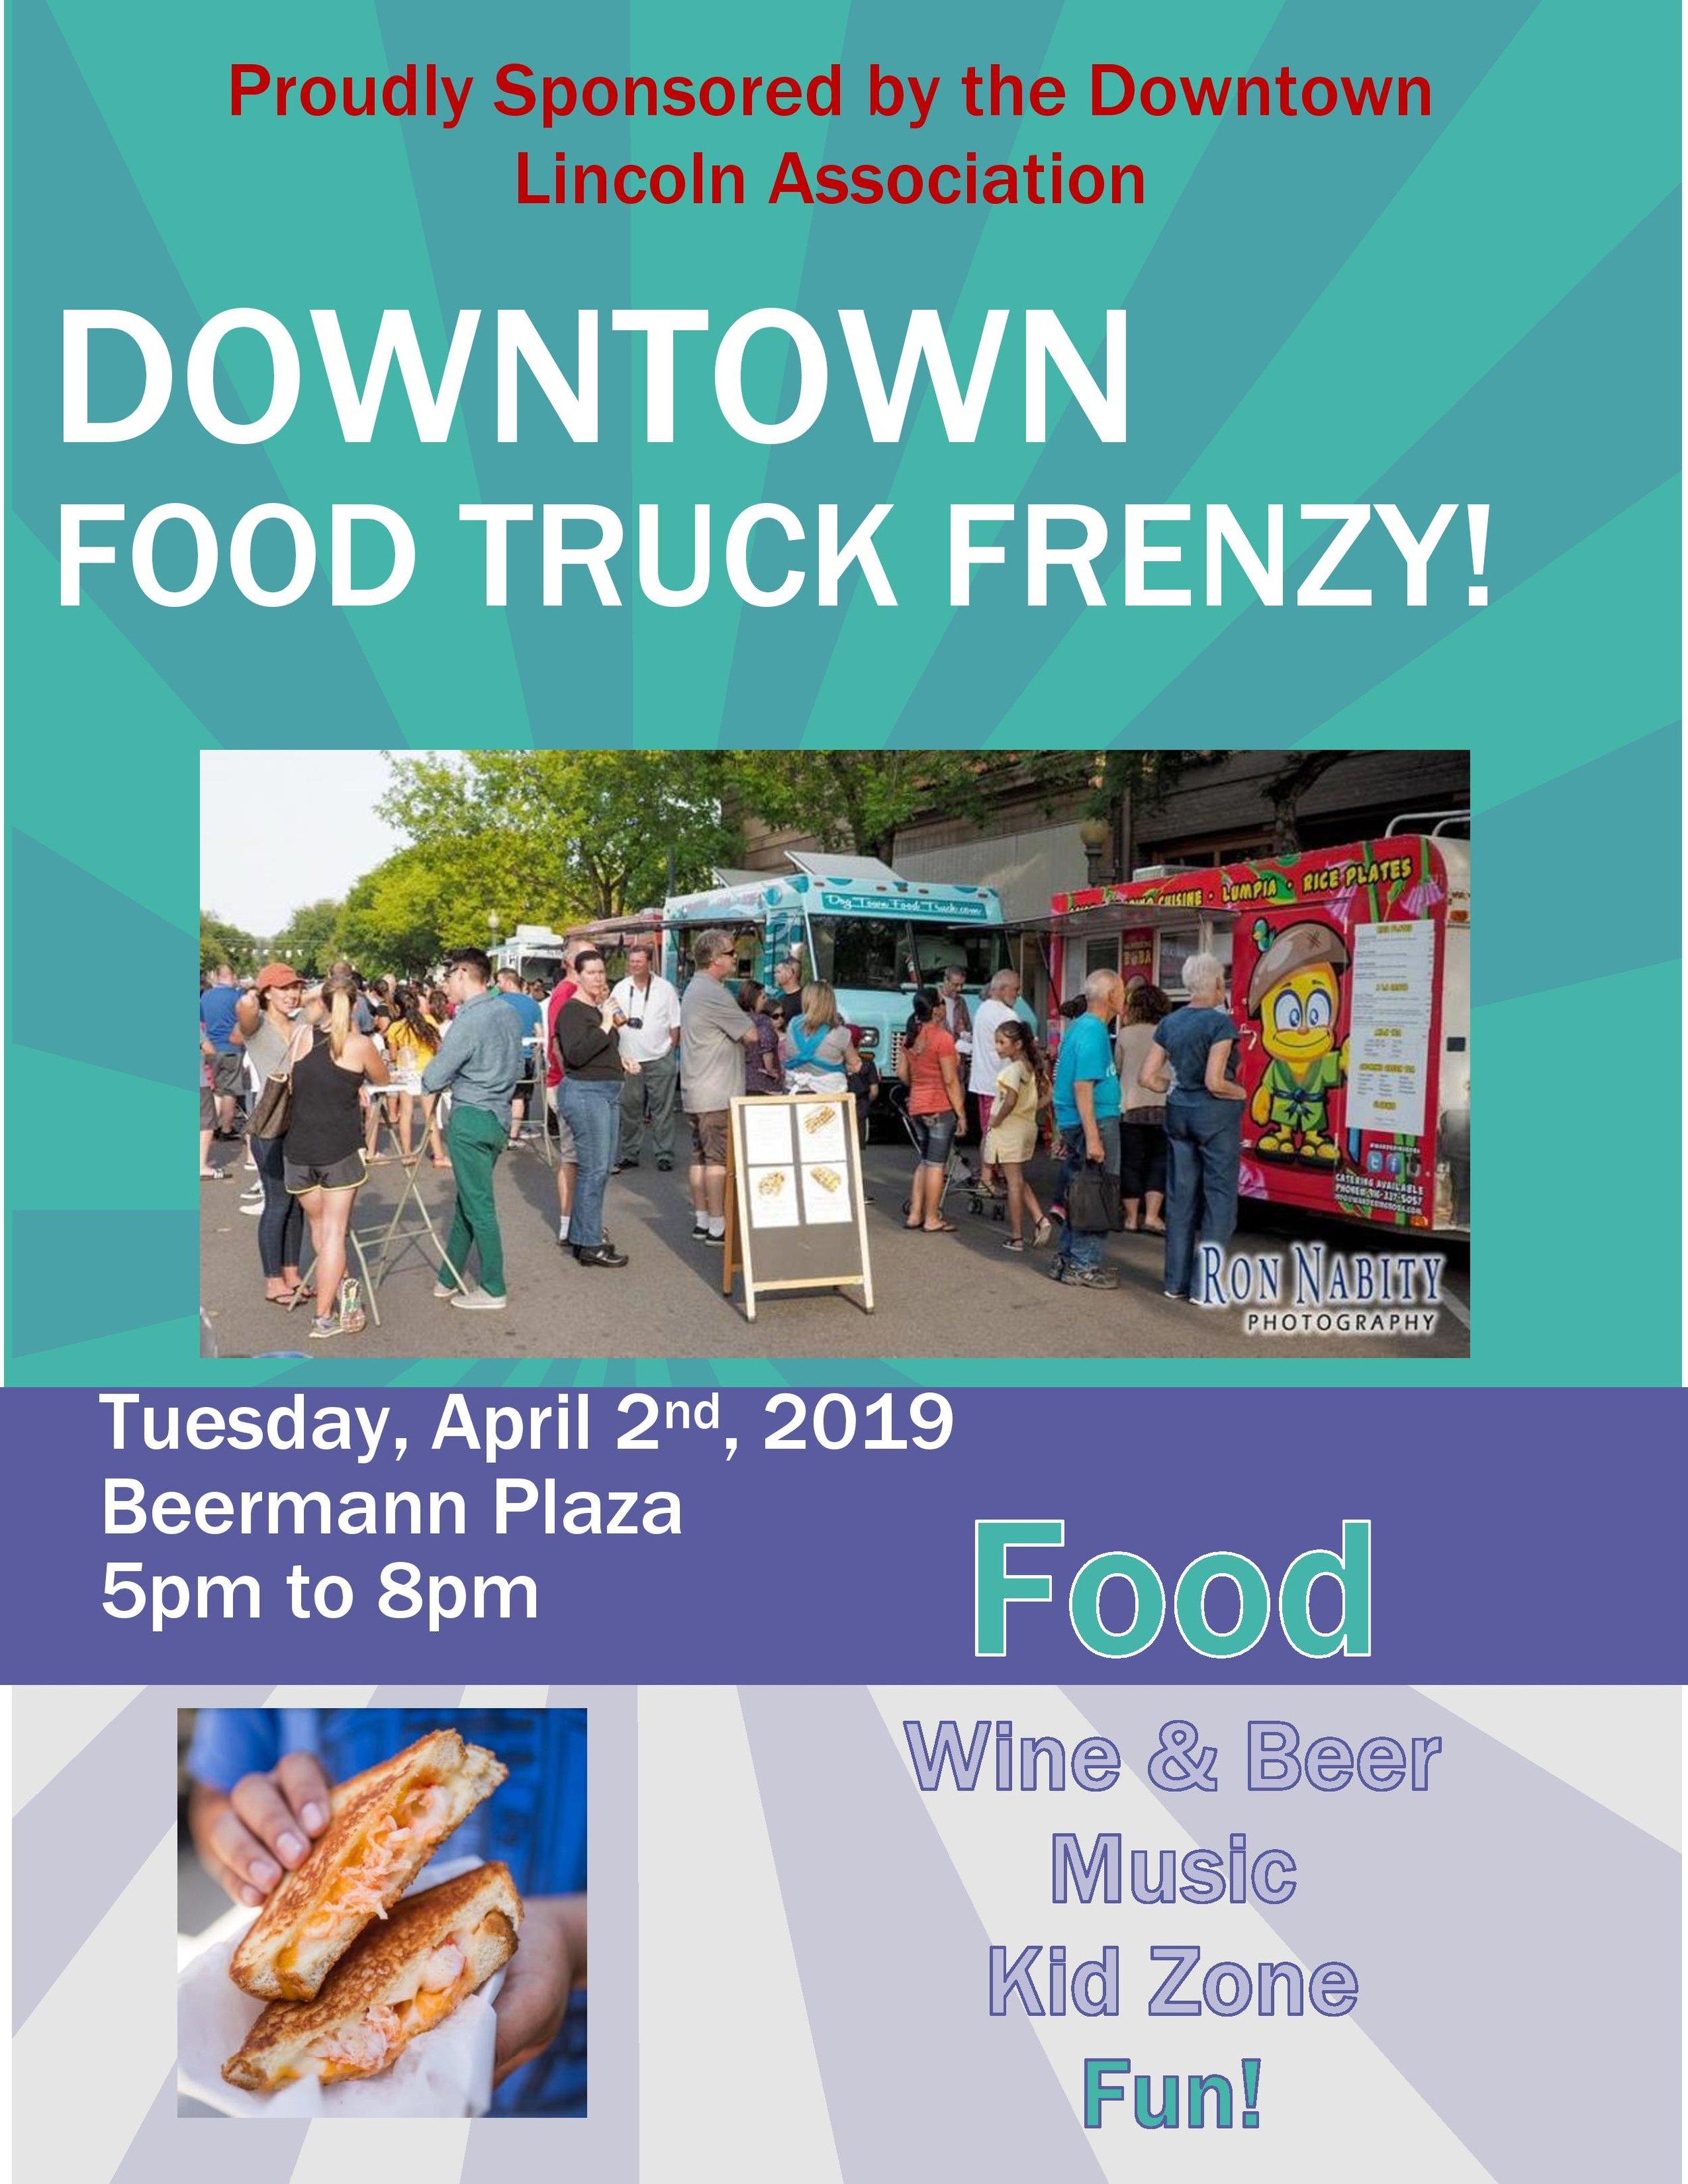 Food Truck Frenzy April 2, 2019.jpg